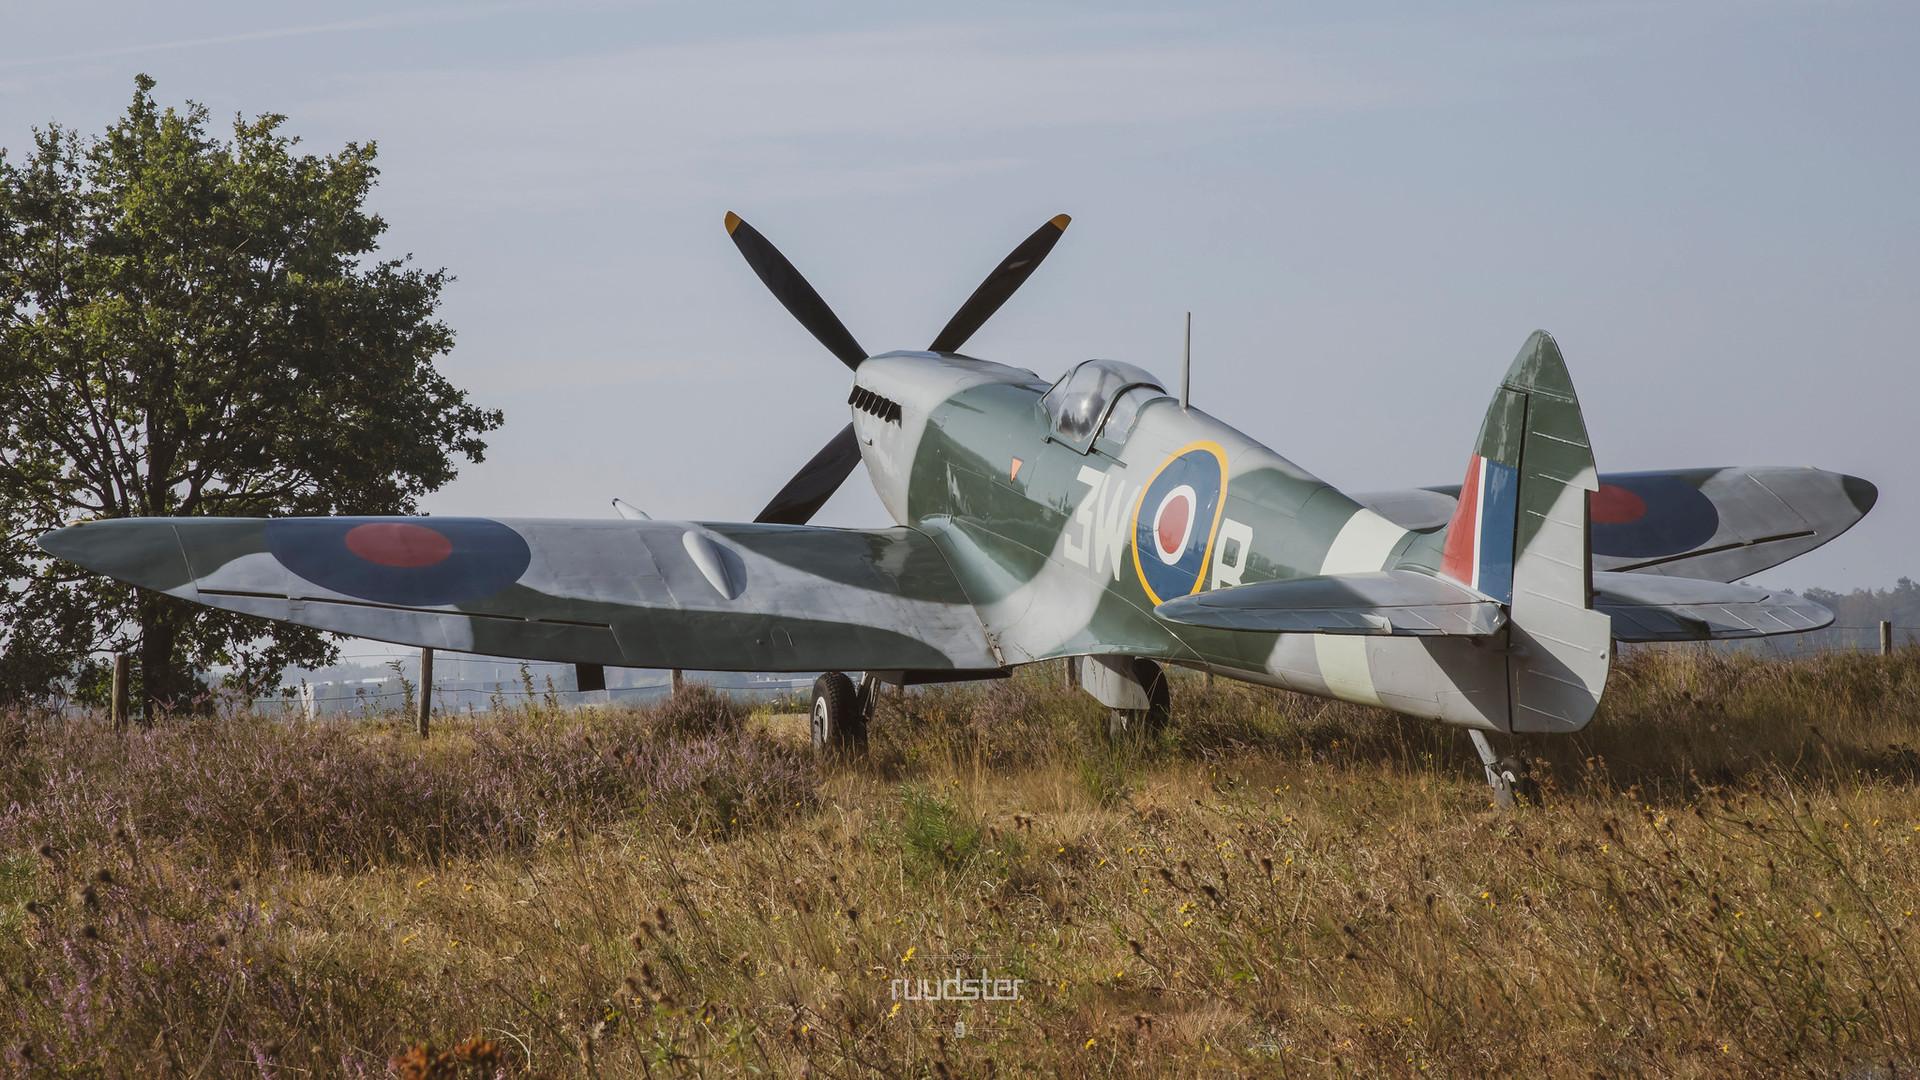 3W-B   Build: 1936 - Super Marine 'Spitfire' Mk.IX